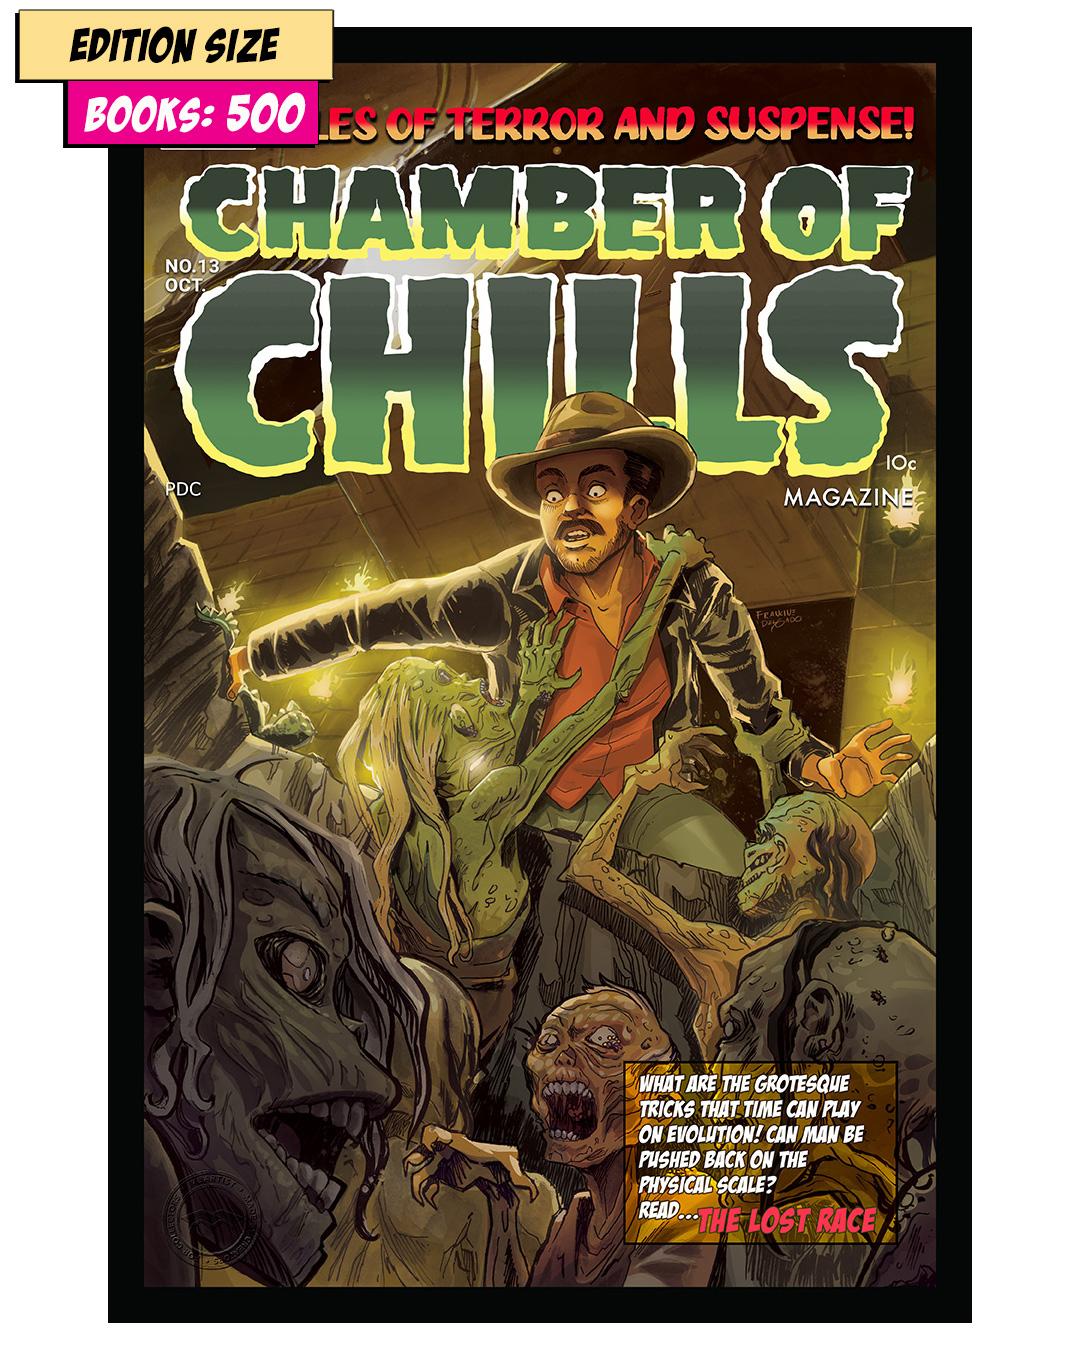 Book - CHAMBER OF CHILLS #13 : REPRINT